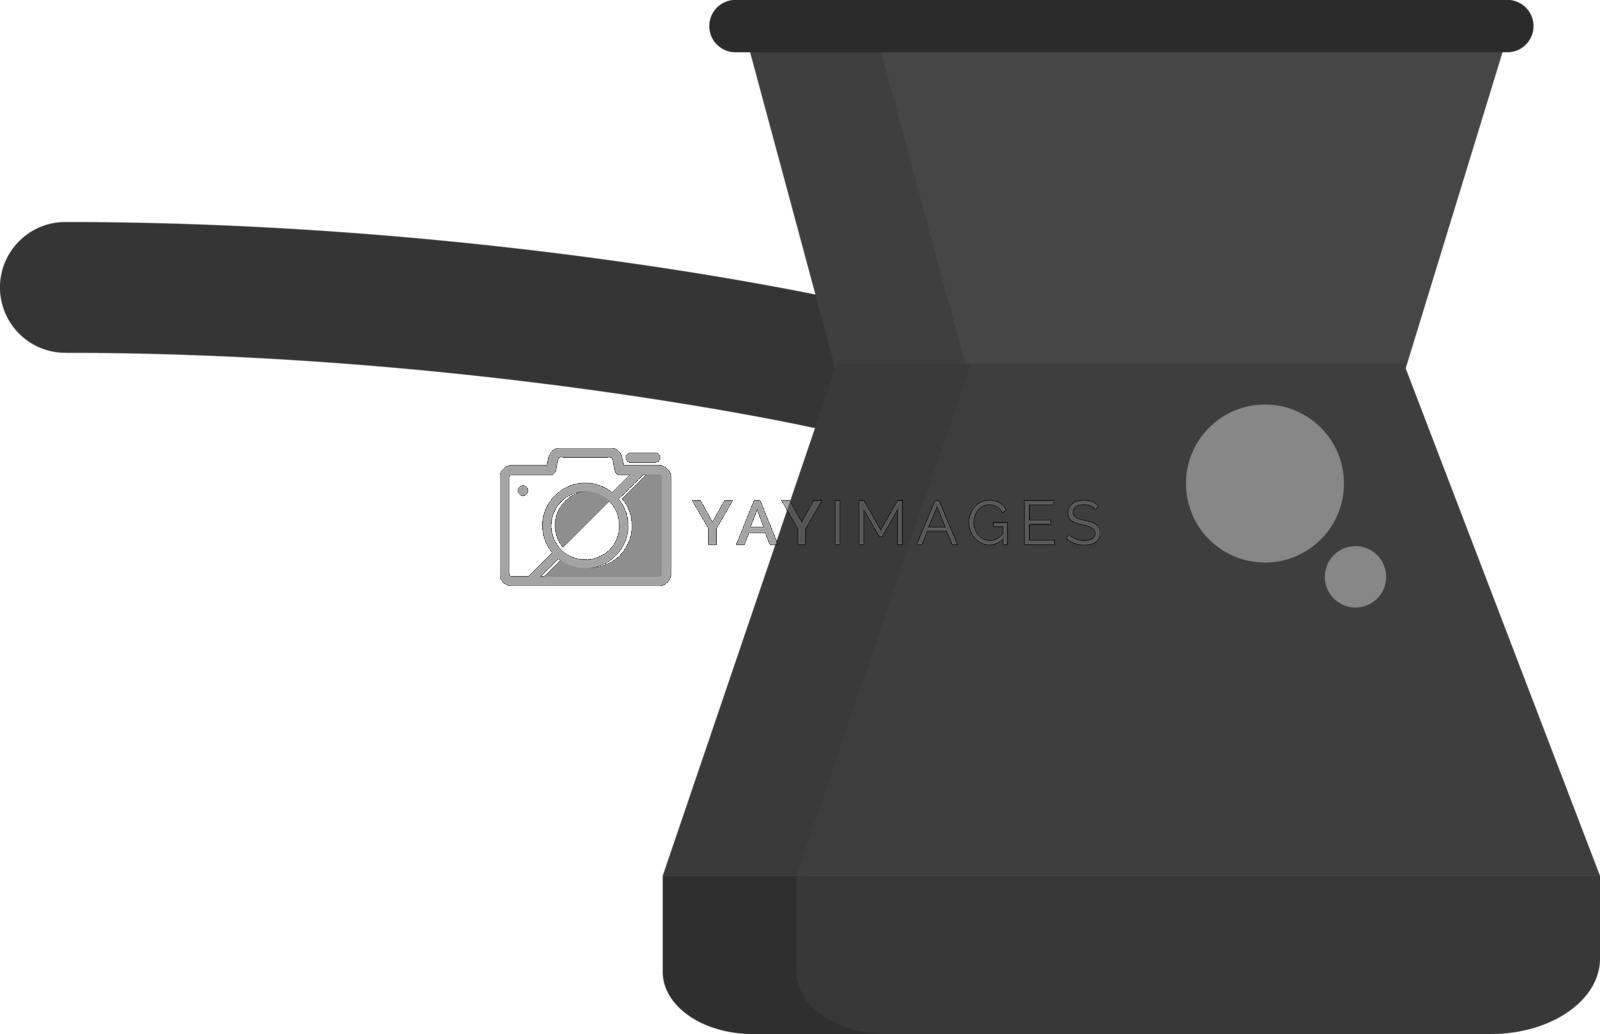 Cezve, illustration, vector on white background.